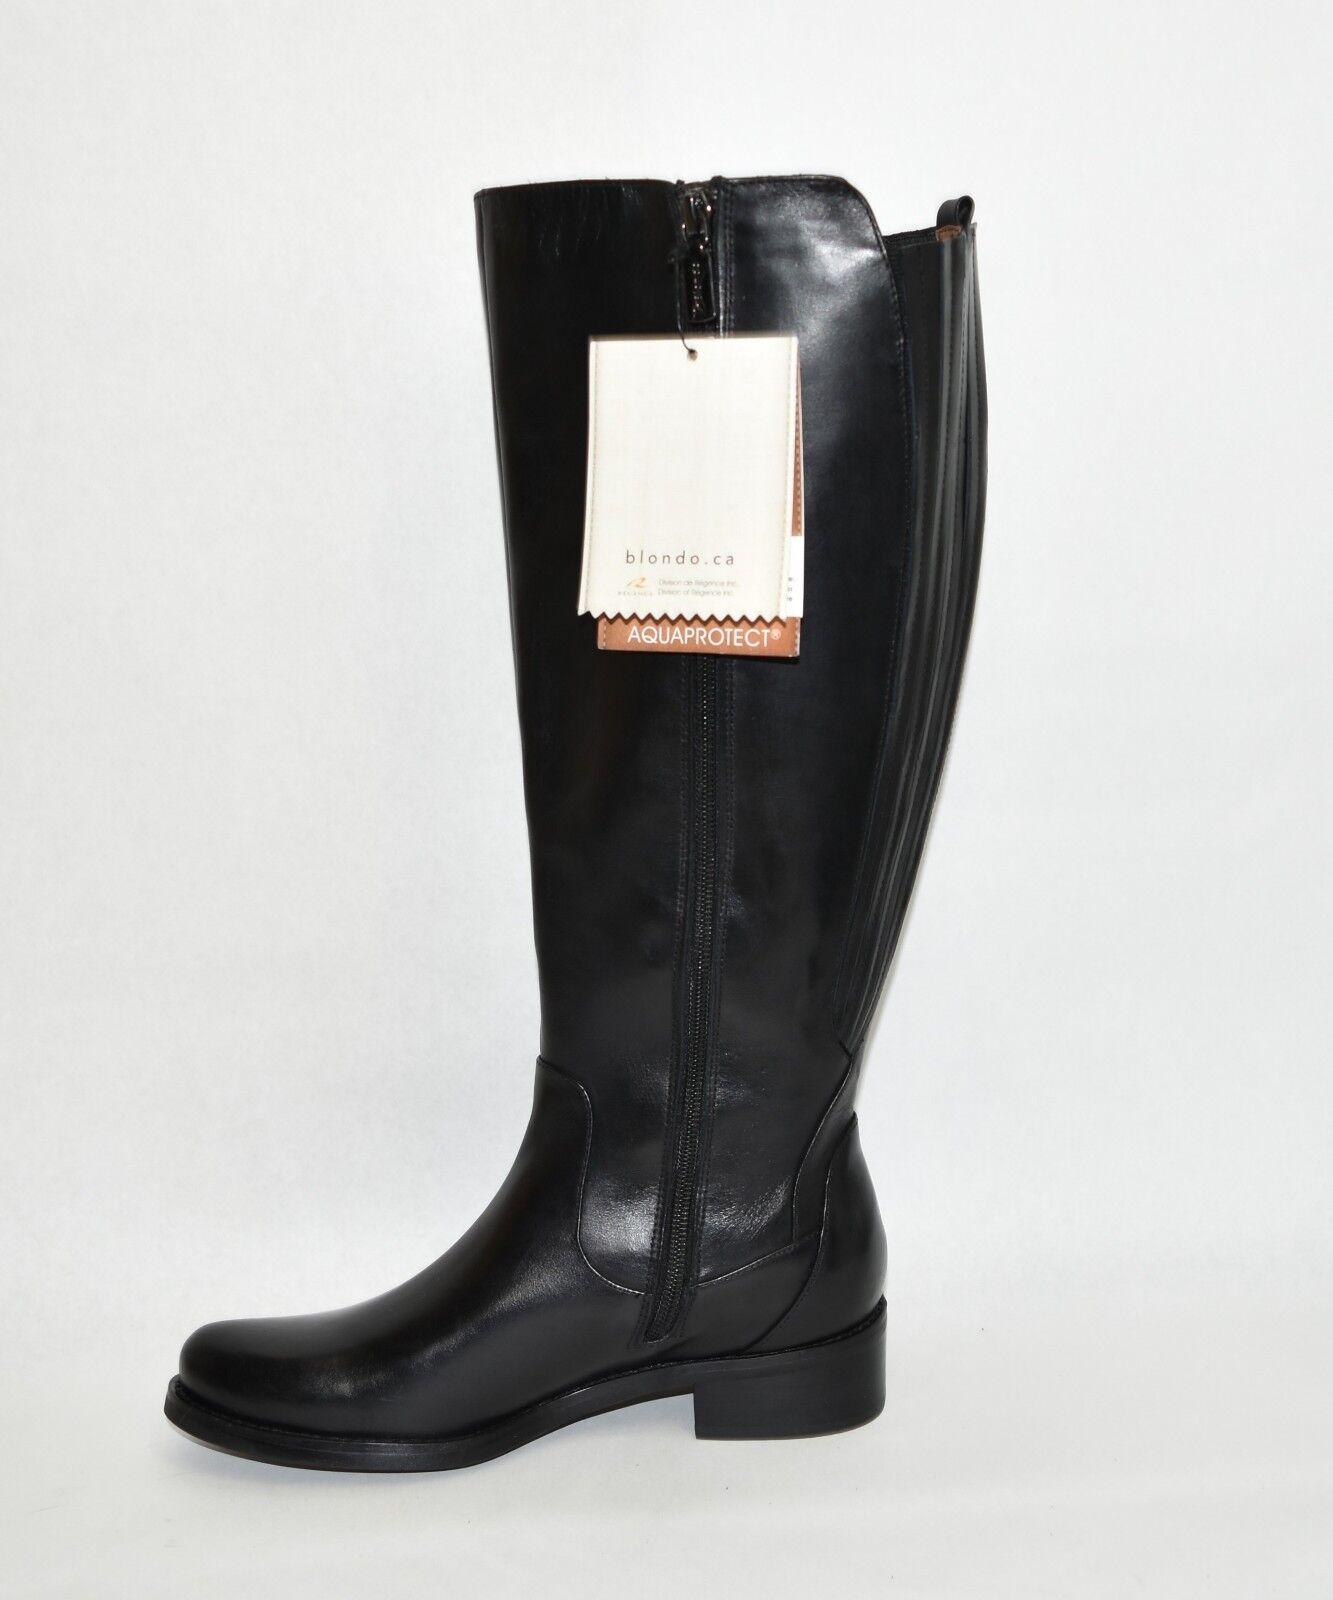 New  Blondo 'Venise' Waterproof Riding Boot Black Leather    B4758 Size 6.5 0eb1c2